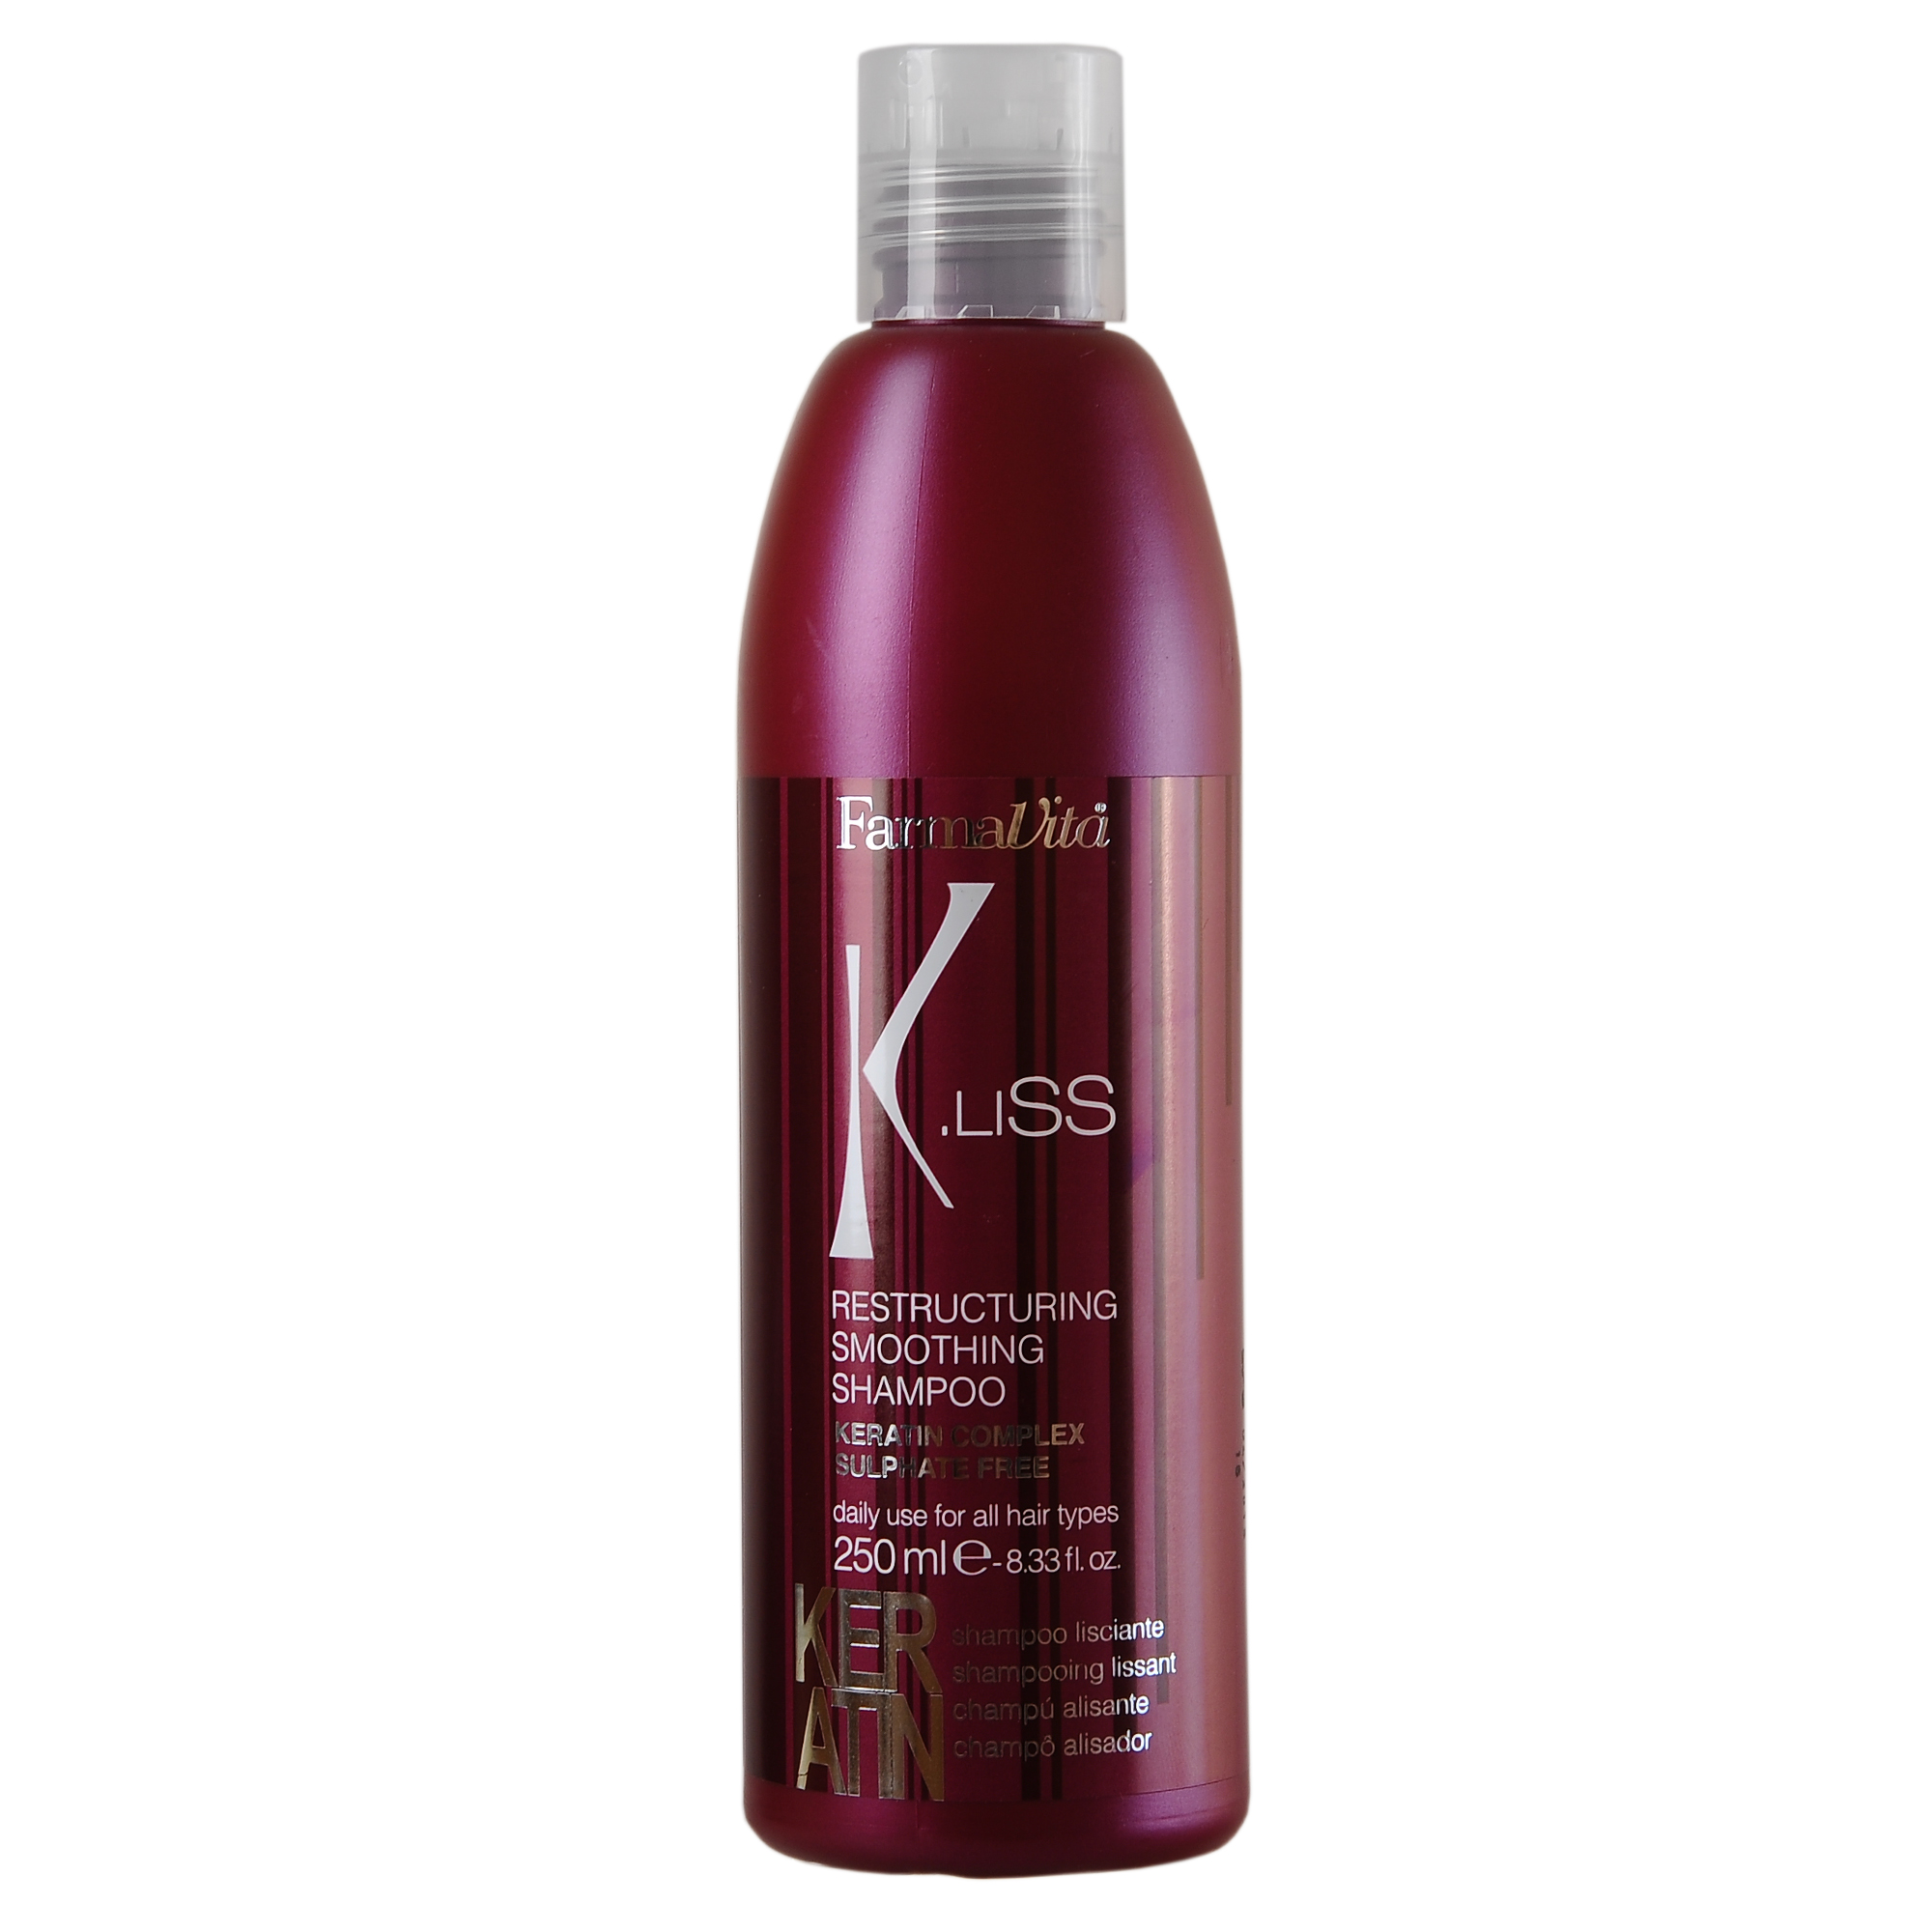 FARMAVITA Шампунь реструкт. с кератином K.Liss Restructuring smoothing shampoo / K.LISS 250 мл